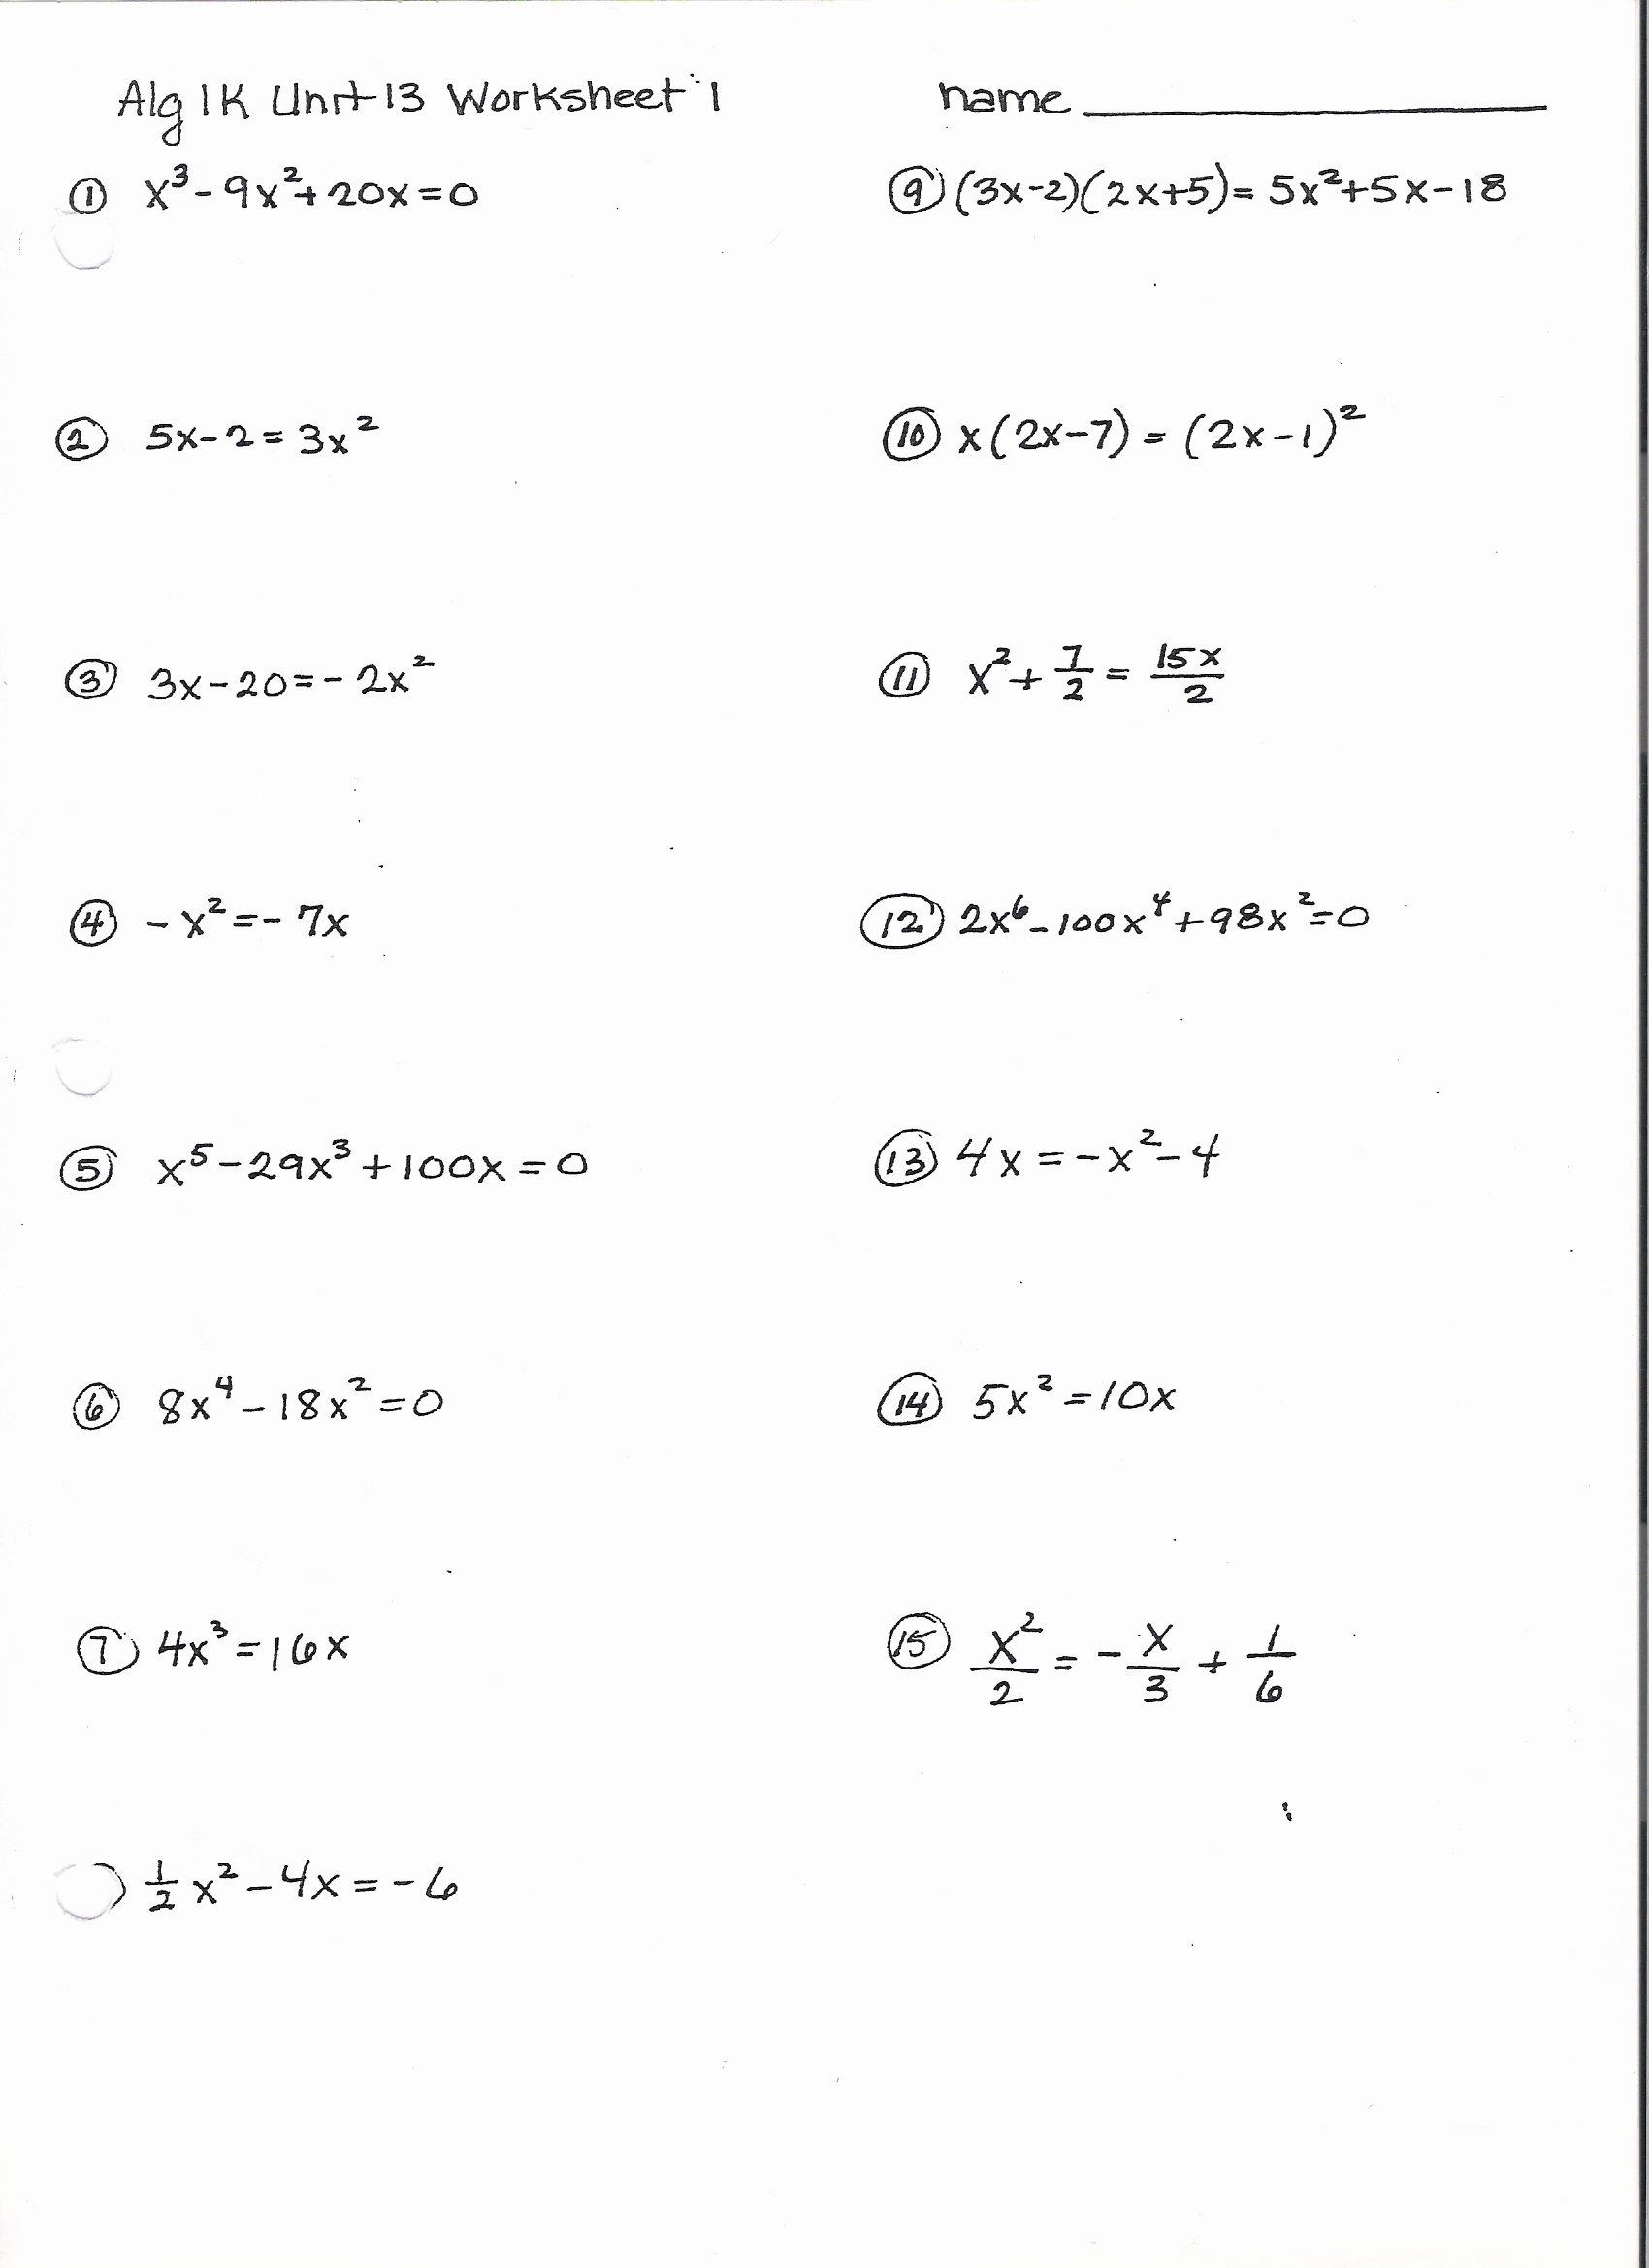 Factoring Worksheet with Answers Elegant 11 Best Of Factoring Worksheets Algebra Ii